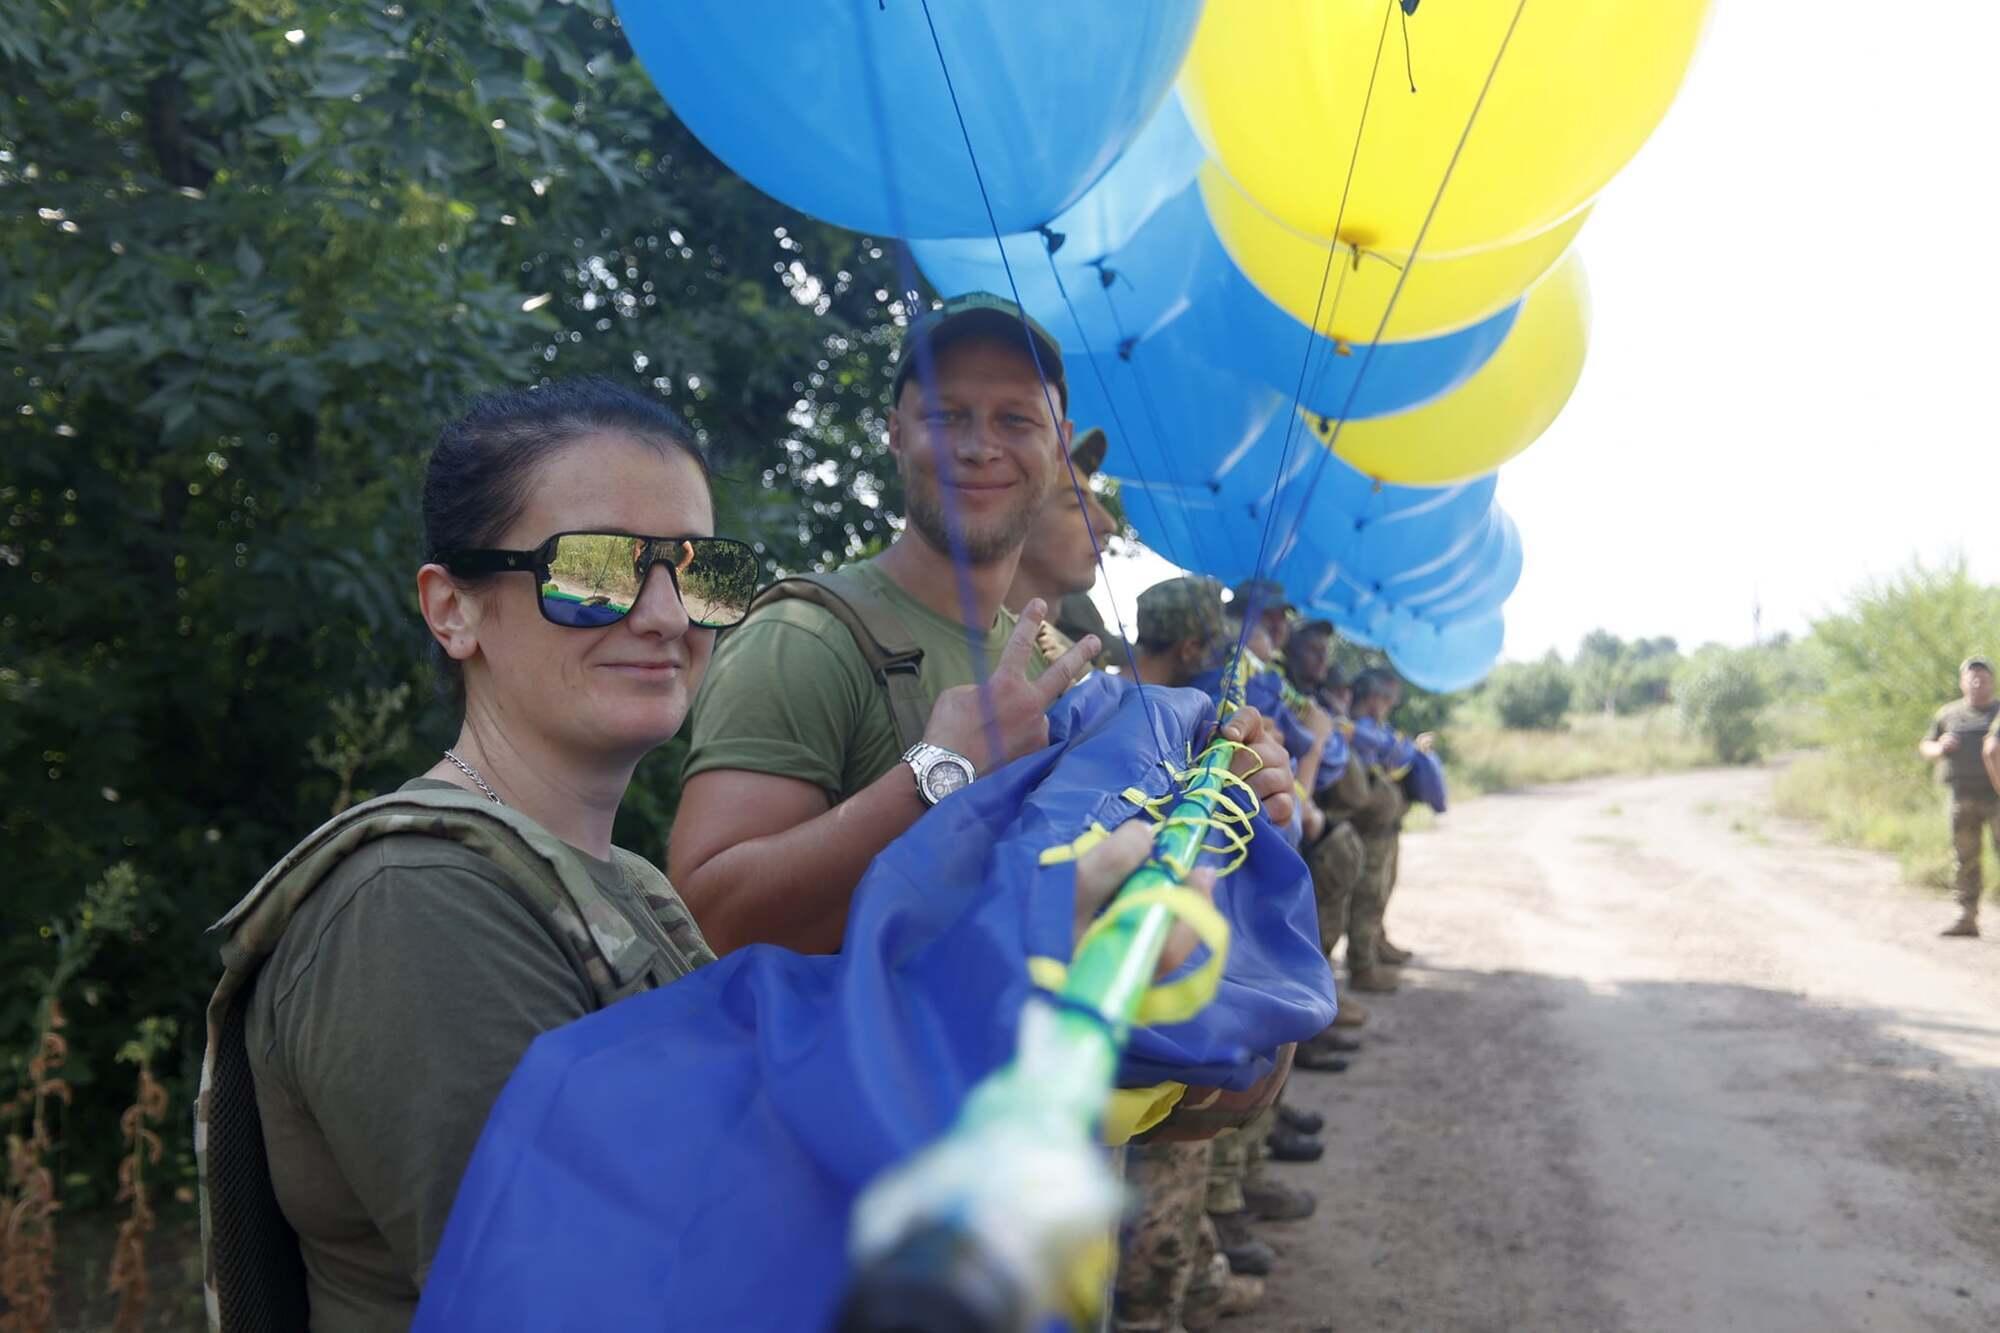 Флаг подвесили на воздушные шарики